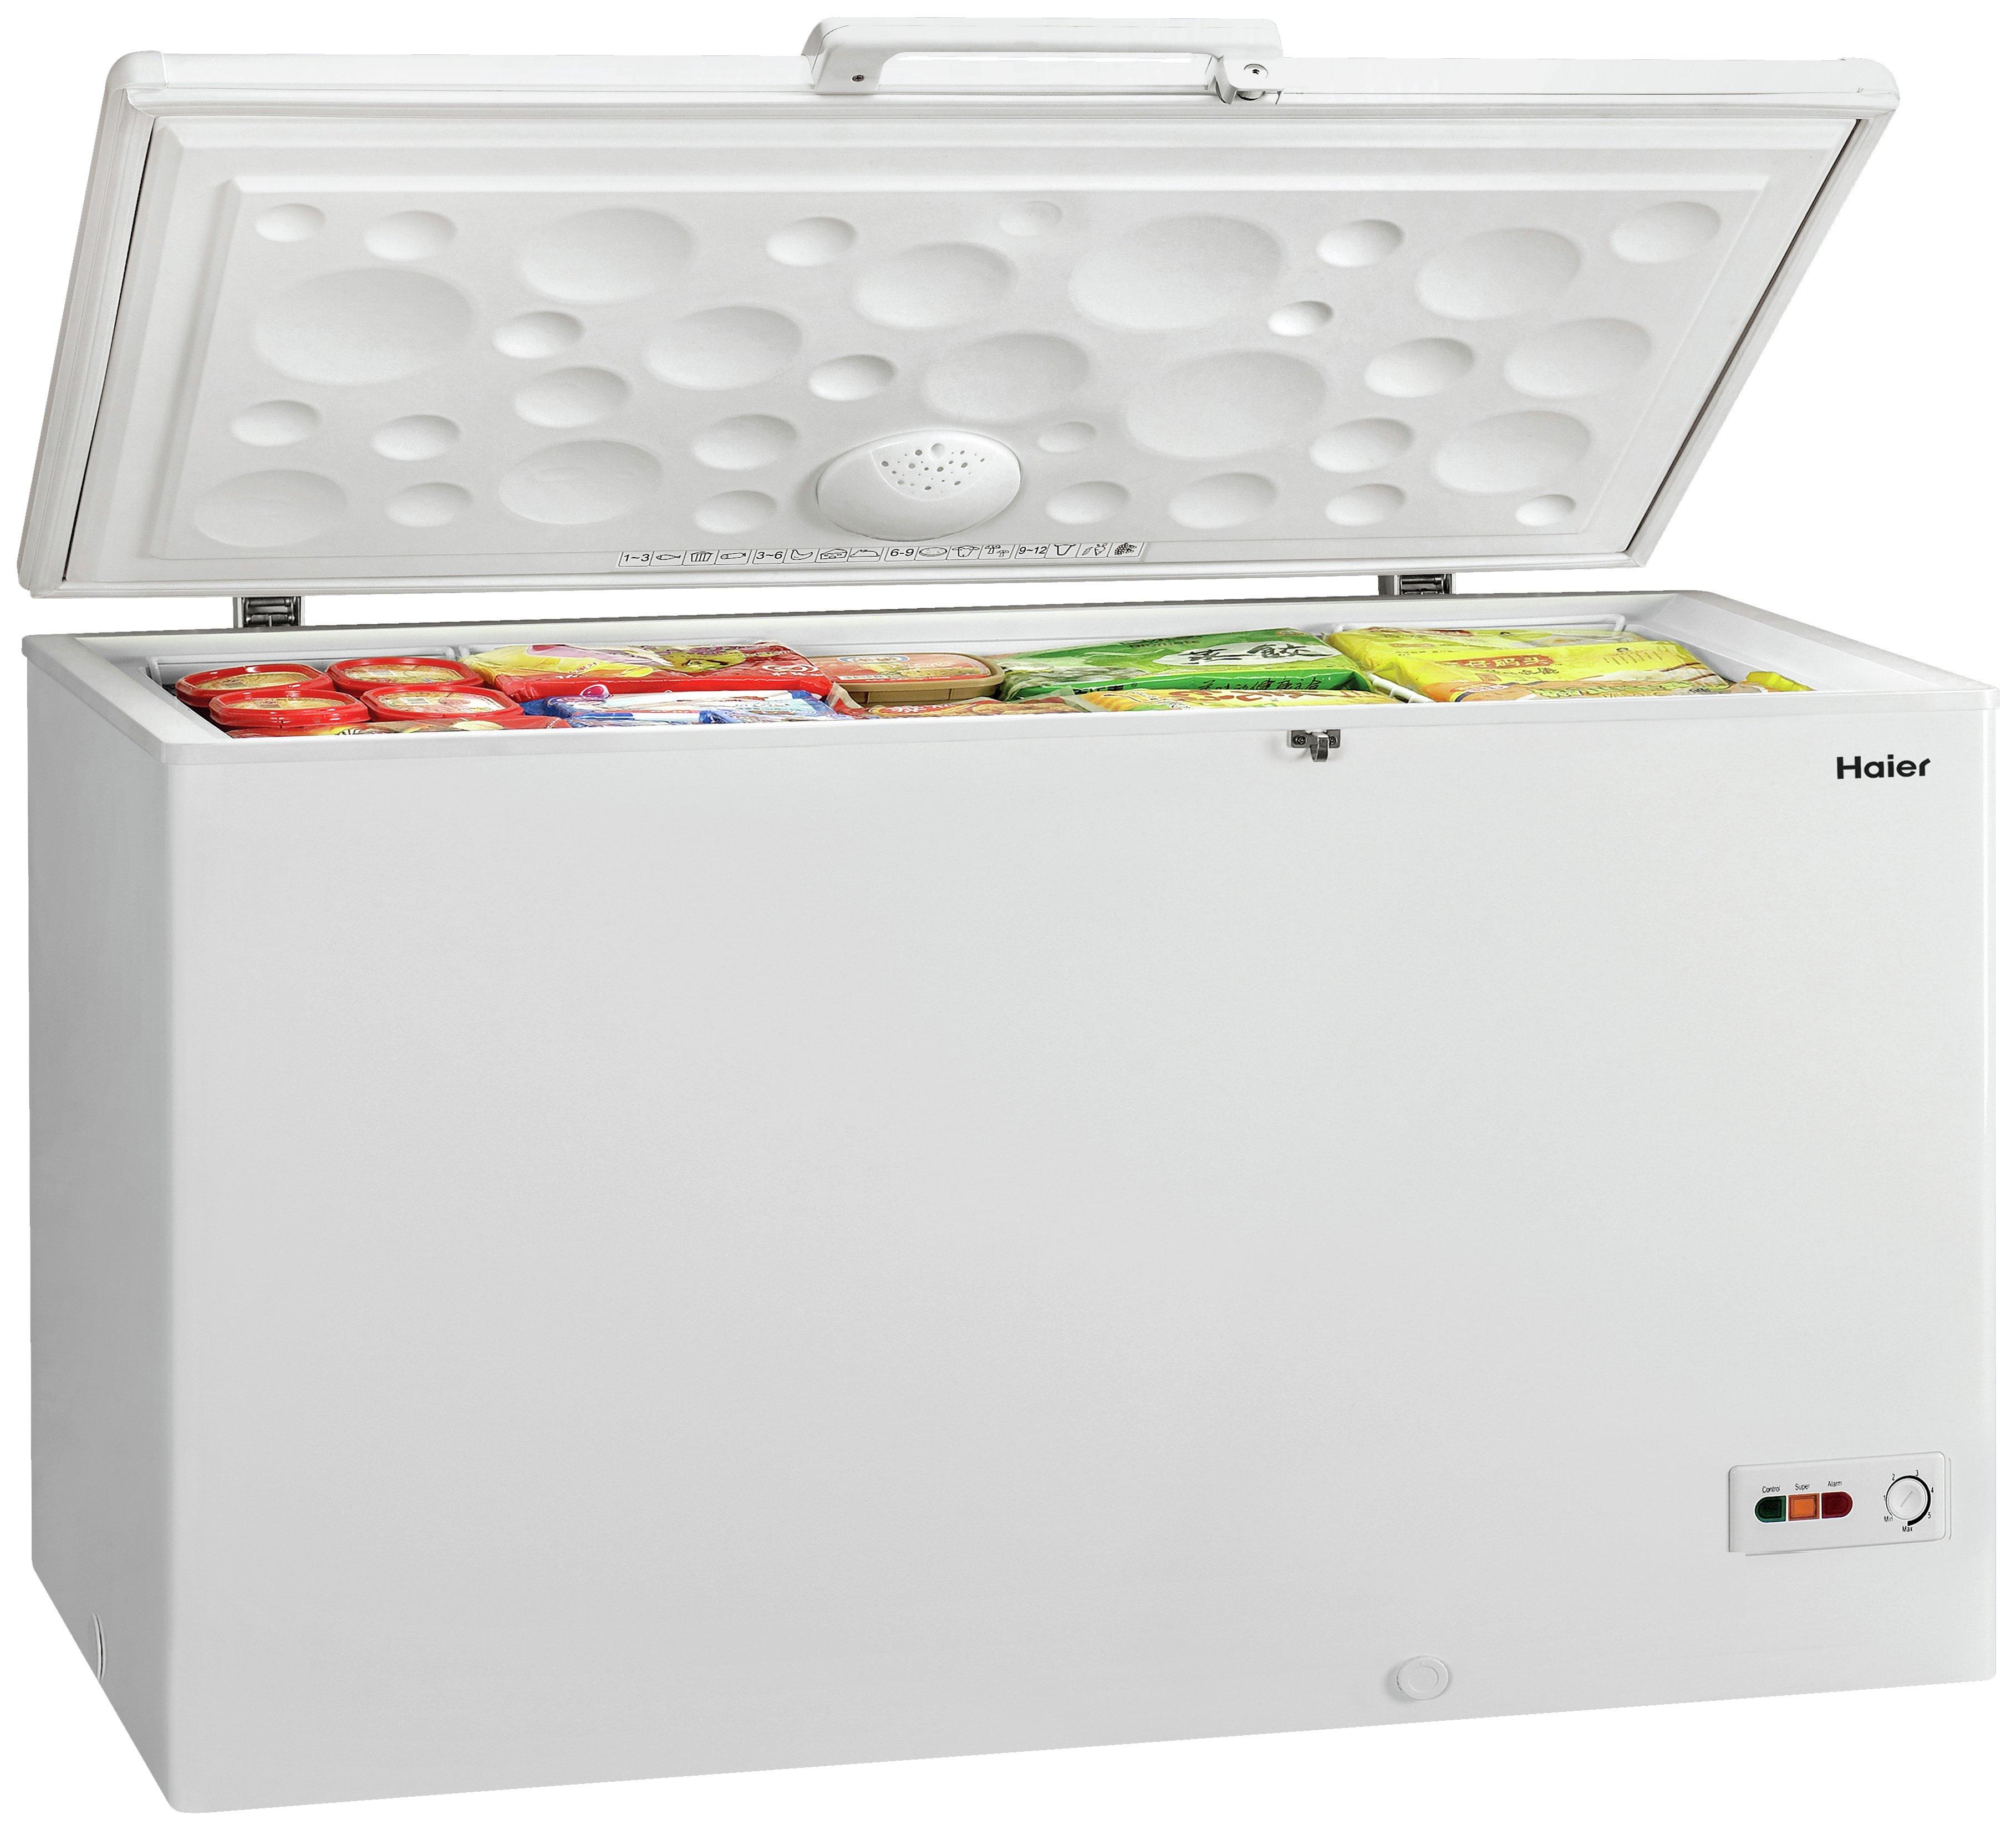 Image of Haier BD-429RAA Chest Freezer - White.